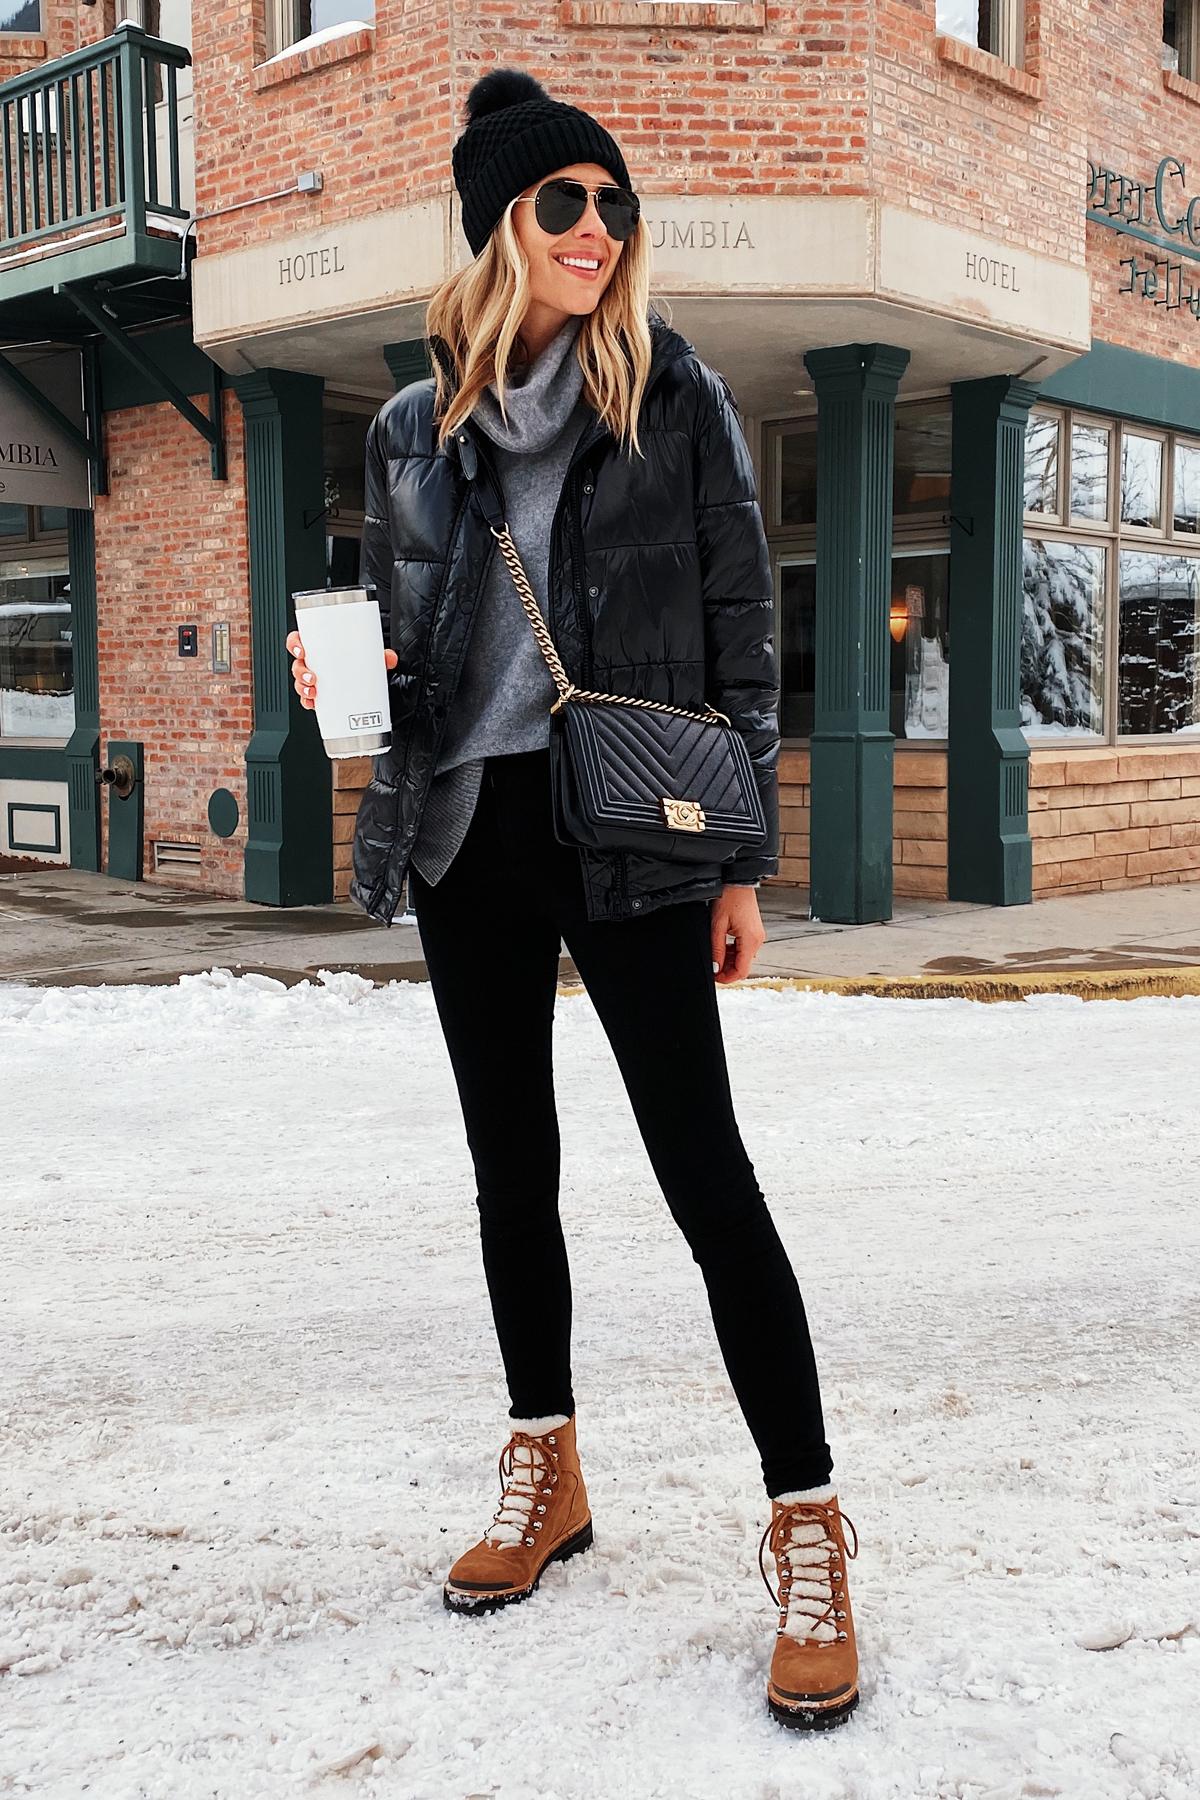 Fashion Jackson Wearing Black Puffer Coat Grey Turtleneck Sweater Black Jeans Winter Boots Black Beanie